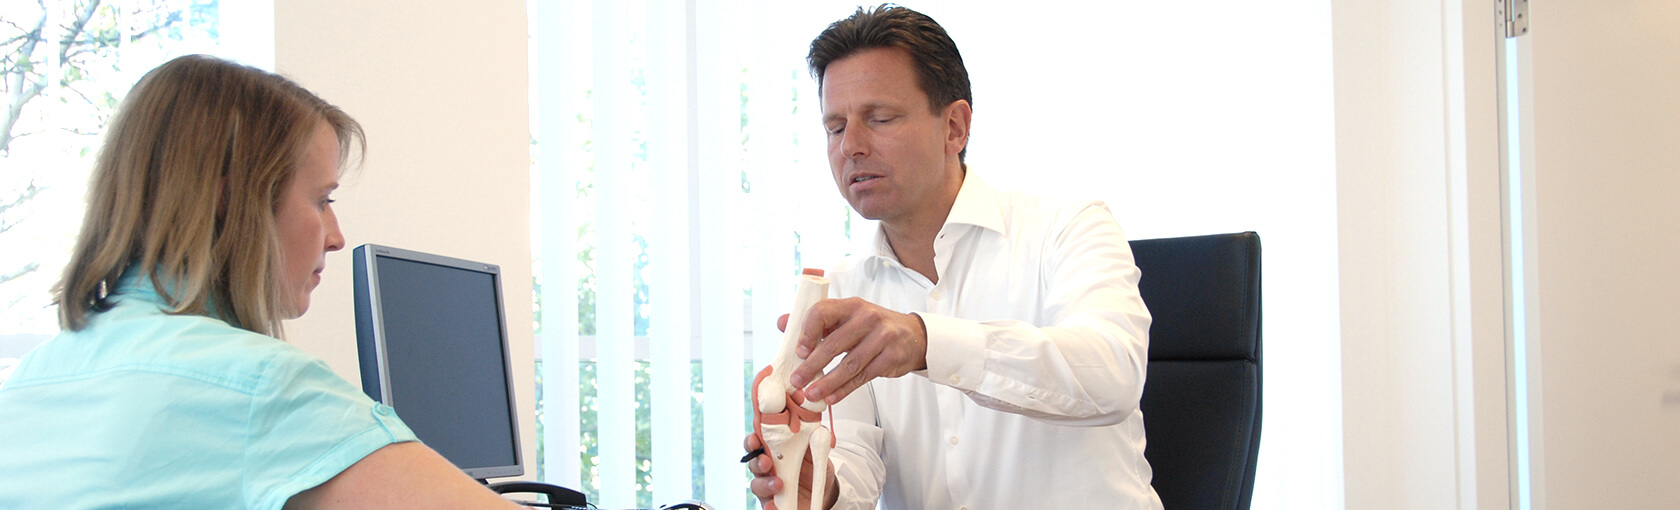 Dr. Czerlitzki OK Kudamm Orthopädie Berlin